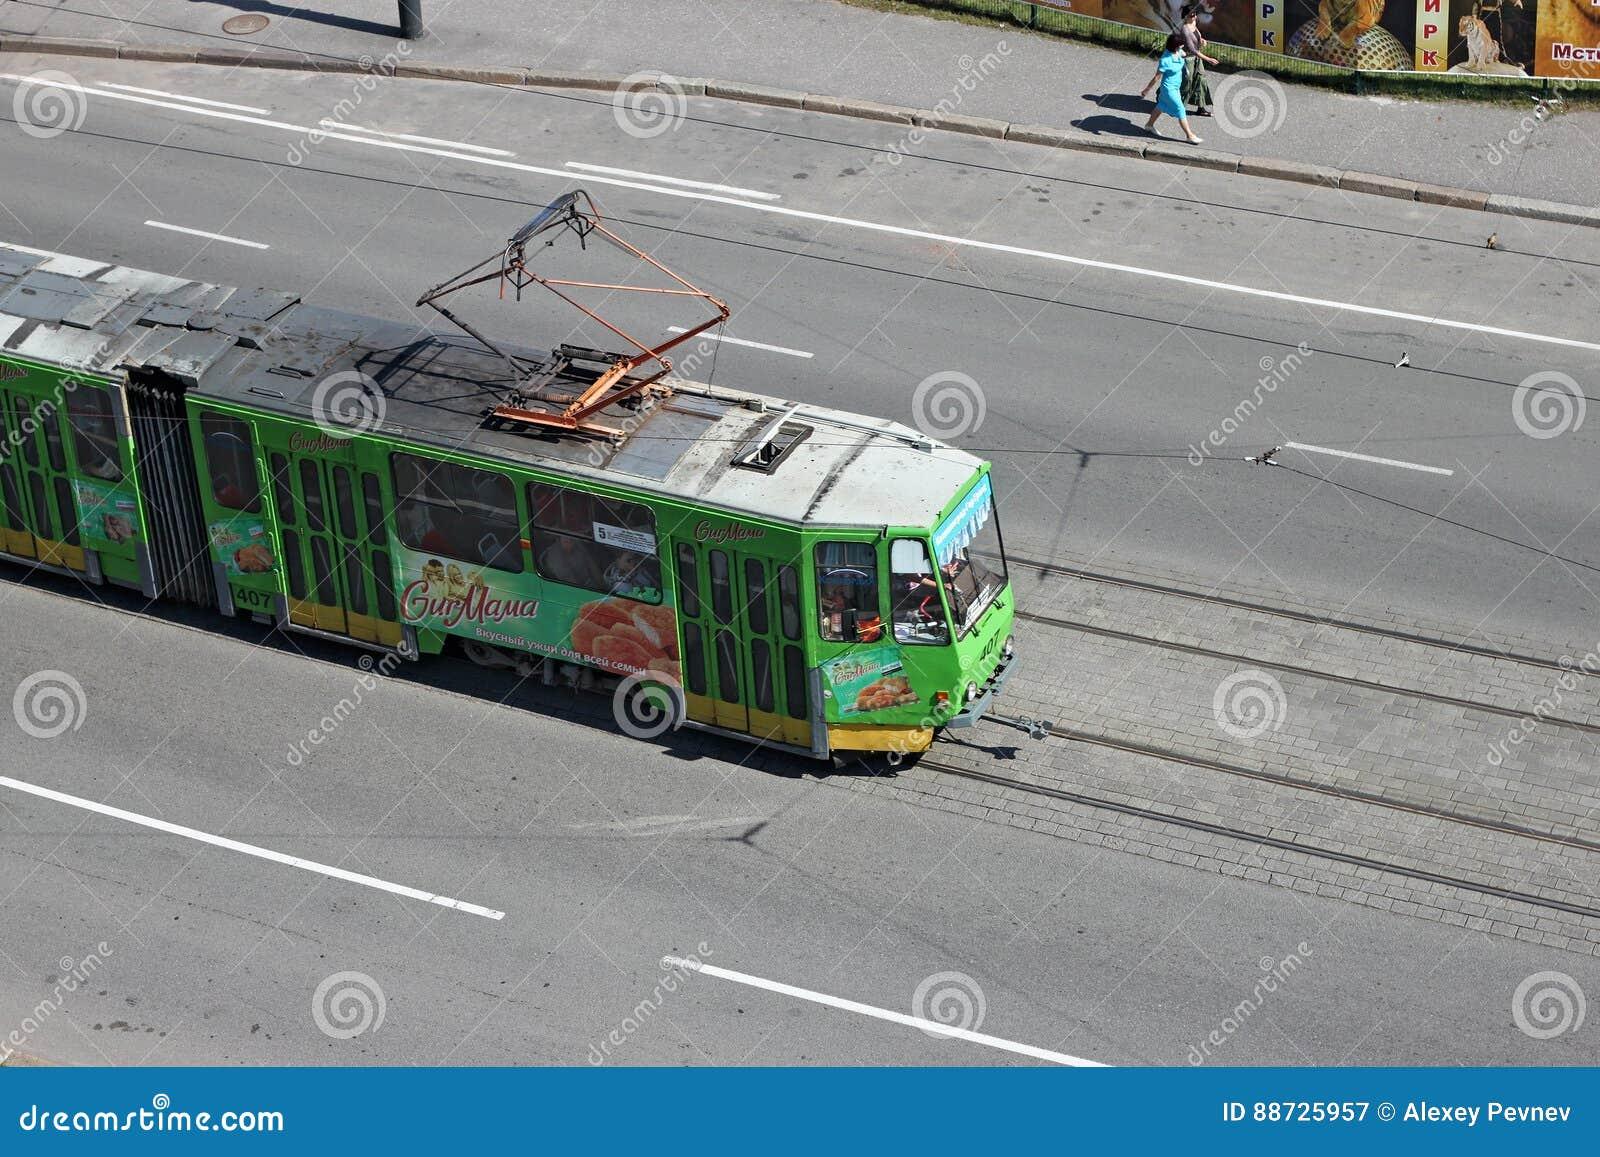 KALININGRAD, RUSSLAND - 21. AUGUST 2011: Tram Tatra KT4 der tschechischen Produktion